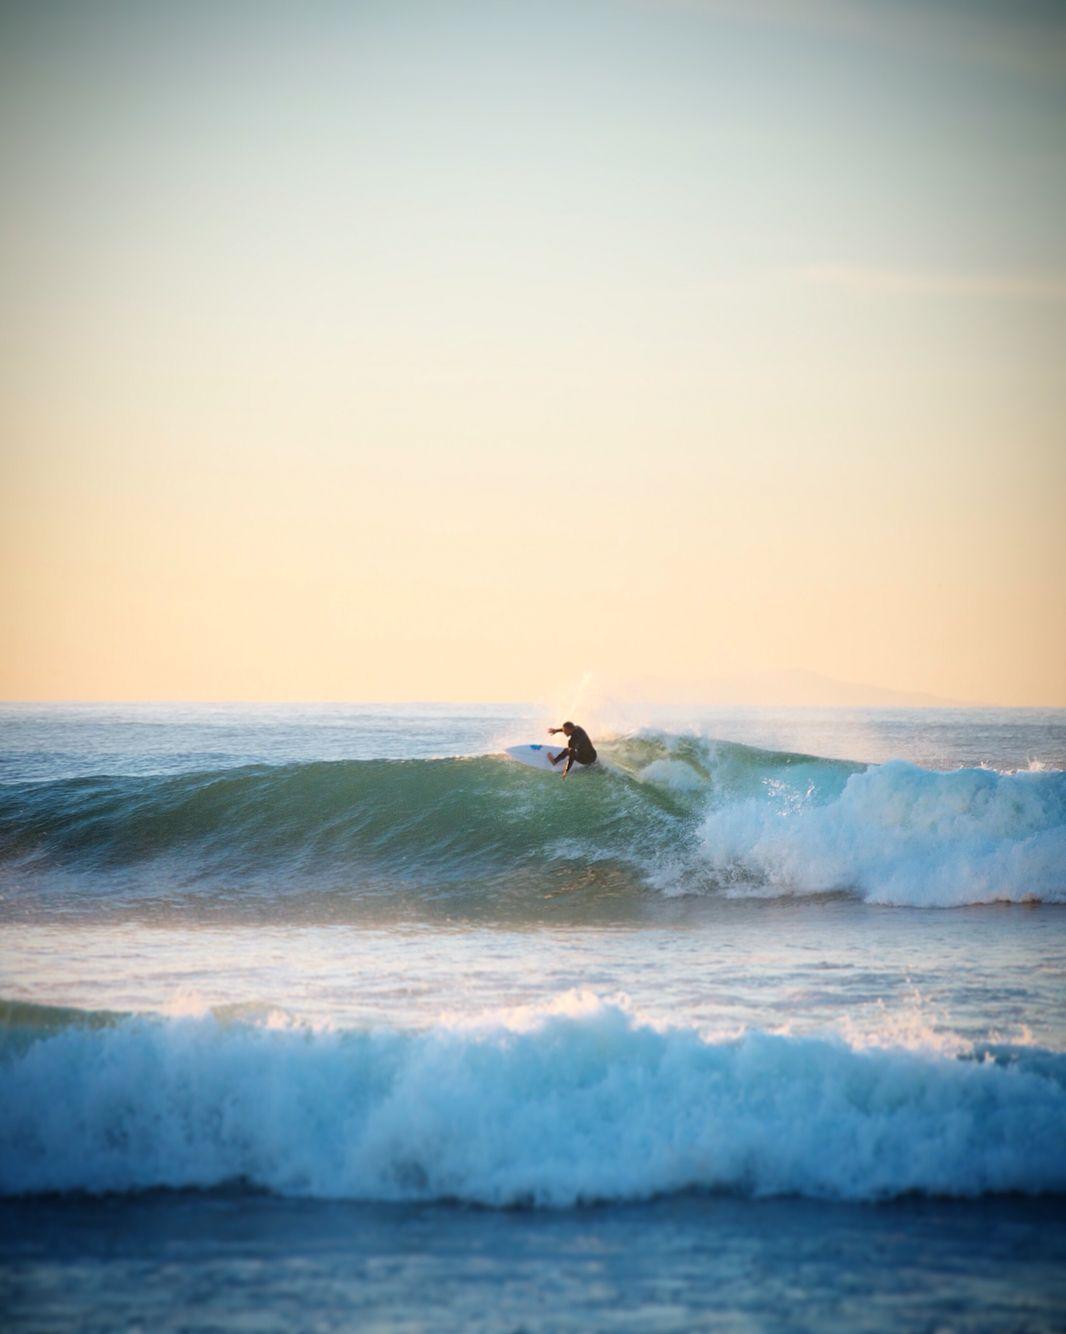 Santa Barbara surf culture. Rincon cove. Surf. Travel